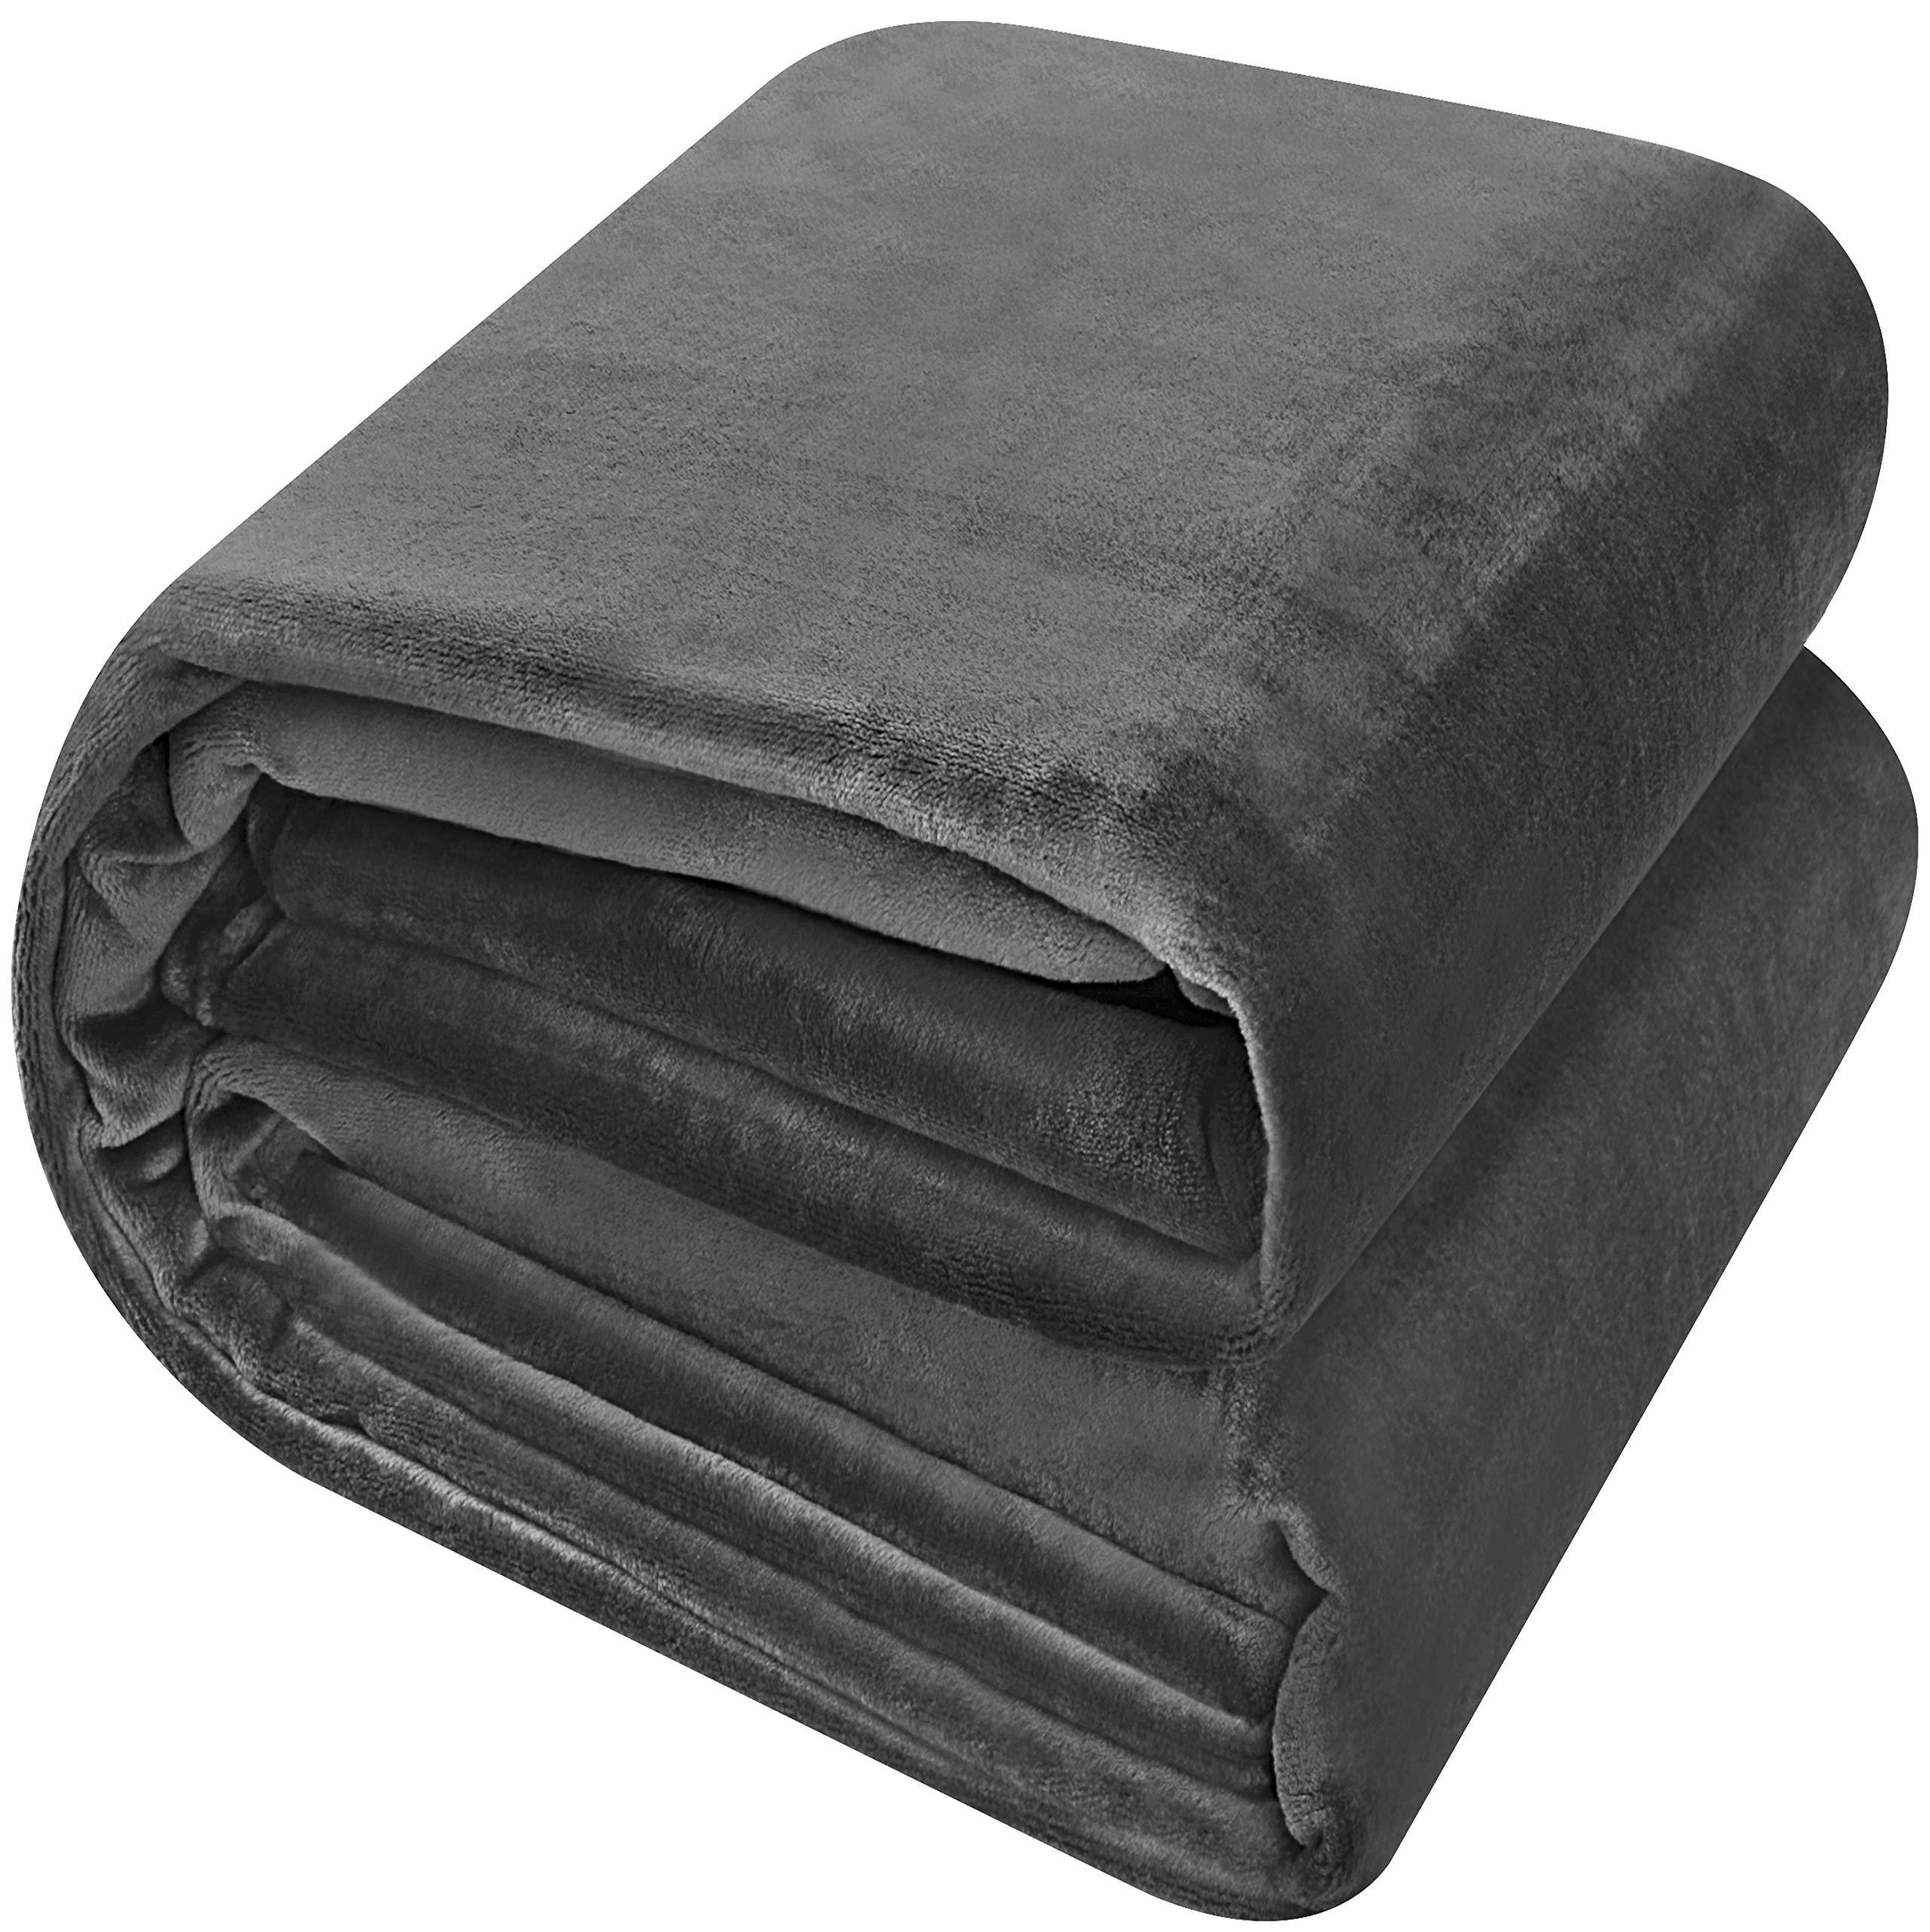 Utopia Bedding Fleece Blanket King Size Grey Luxury Bed Blanket Lightweight Fuzzy Soft Blanket Microfiber